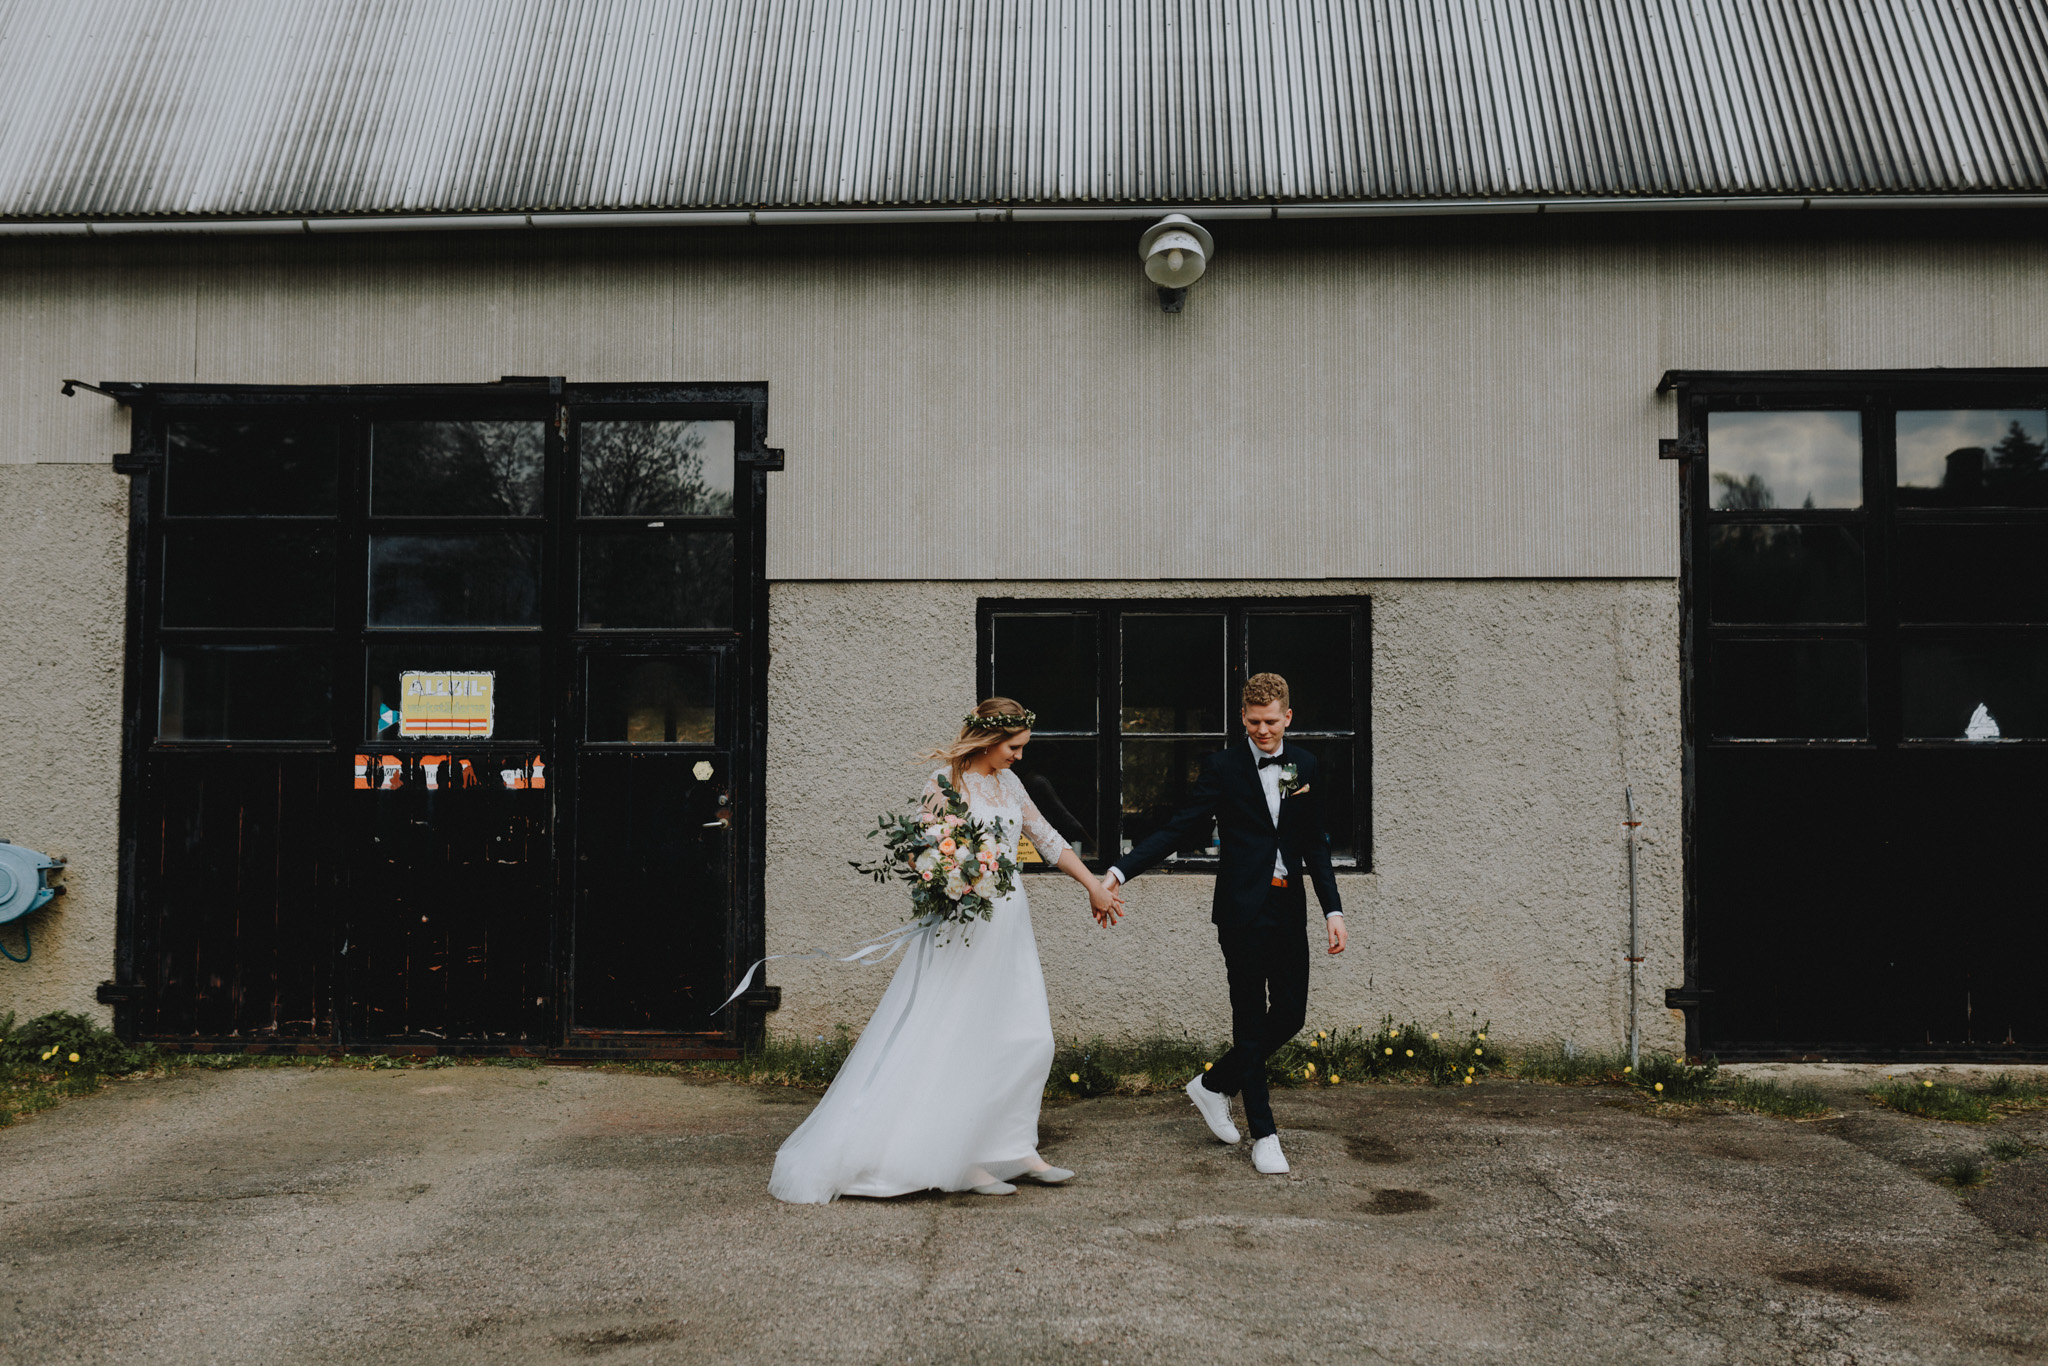 Copenhagen_Wedding_Photographer_Elopement_Photographer_Europe (1 of 1)-2.jpg